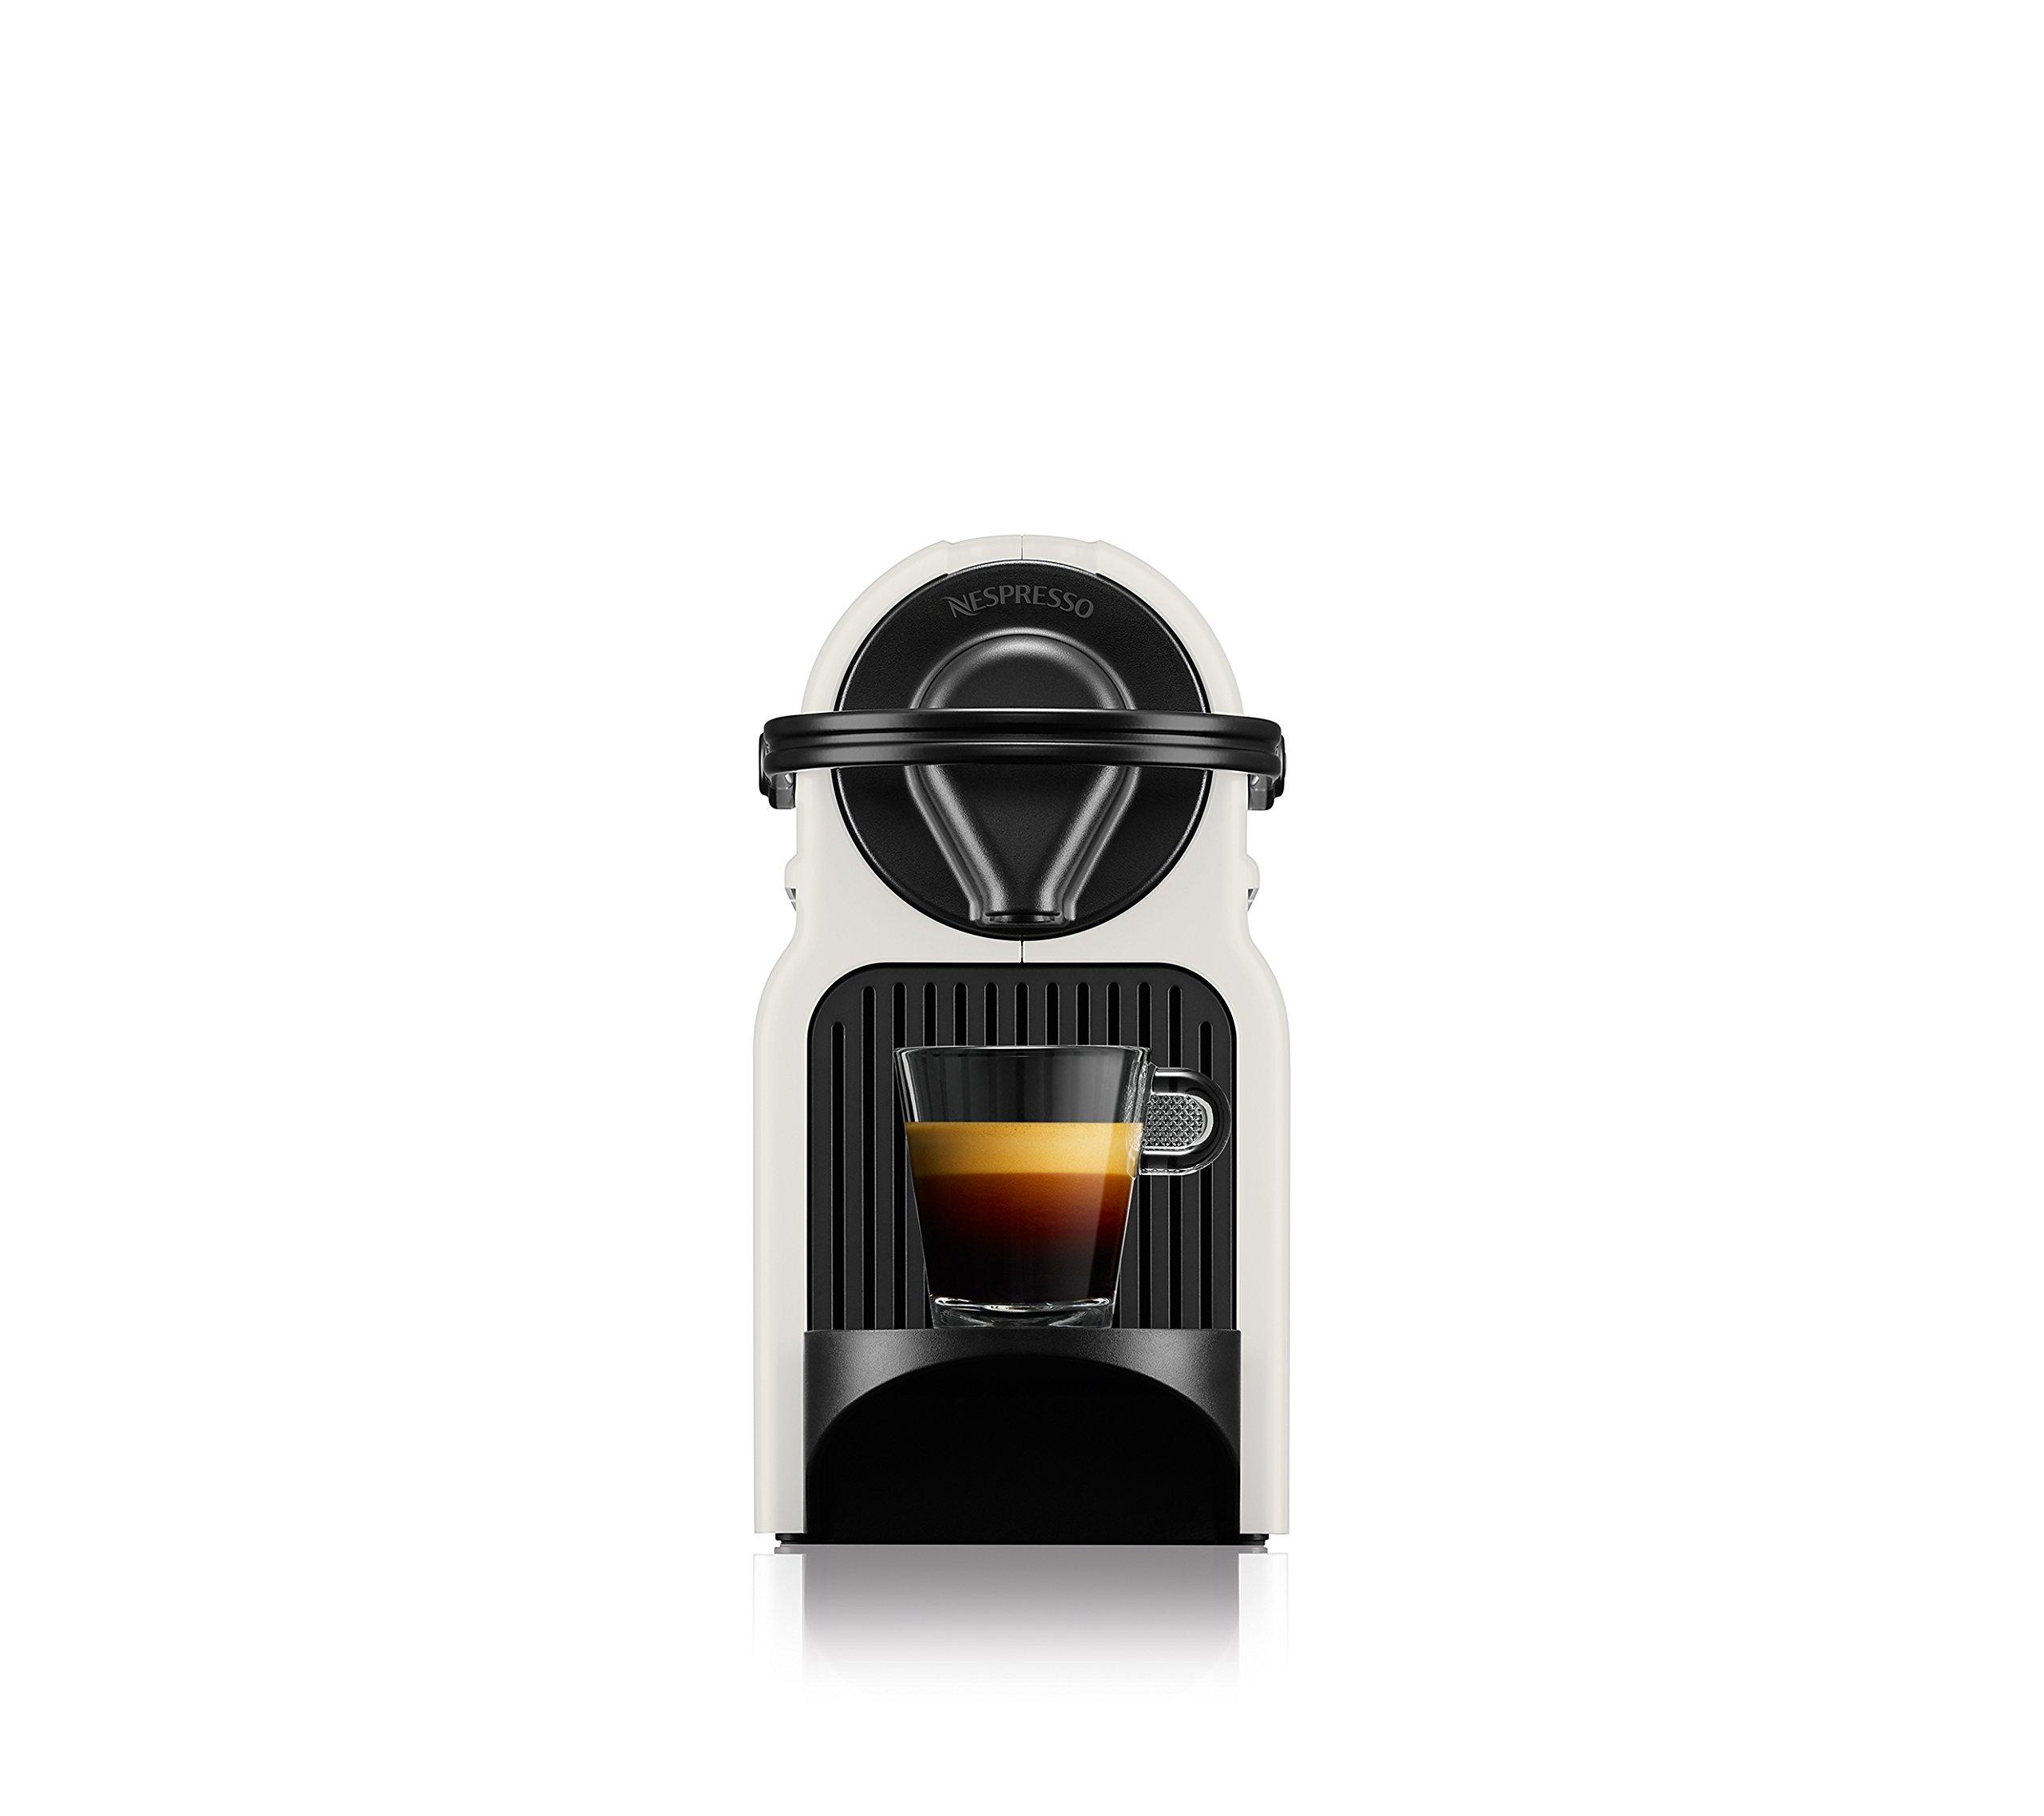 Nespresso Inissia Macchina per caffé espresso, a capsule, 1260 W, 0.7 L, Beige (Vanilla Cream) 3 spesavip